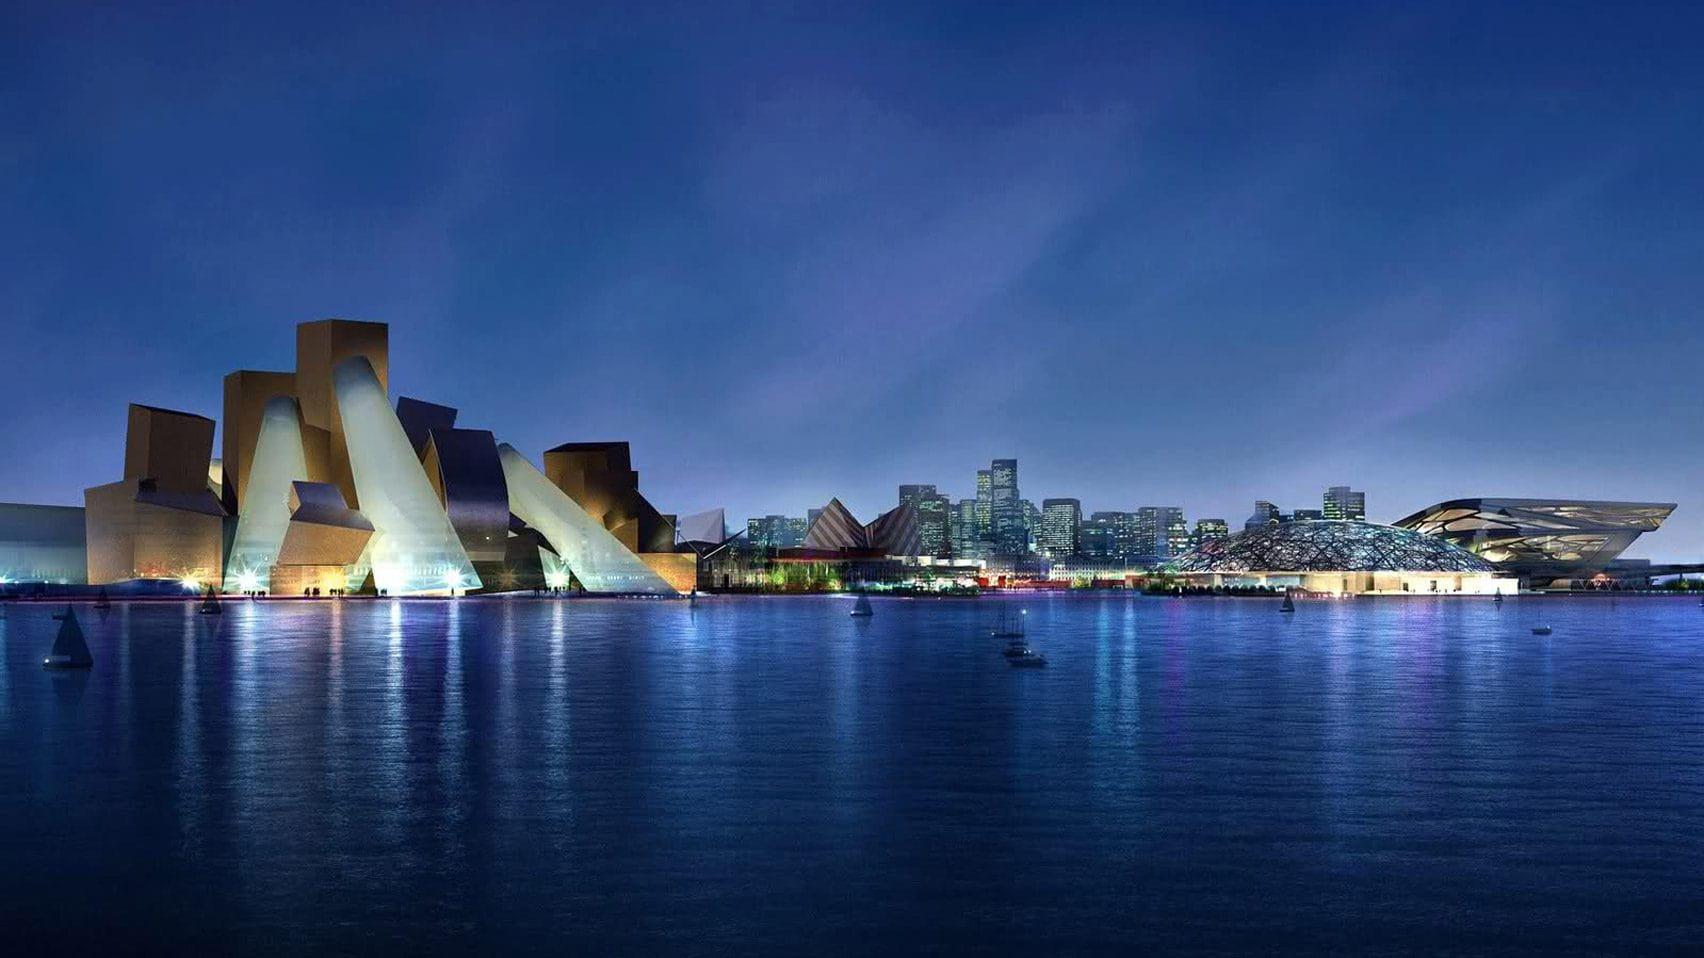 Frank Gehry designed Guggenheim Museum